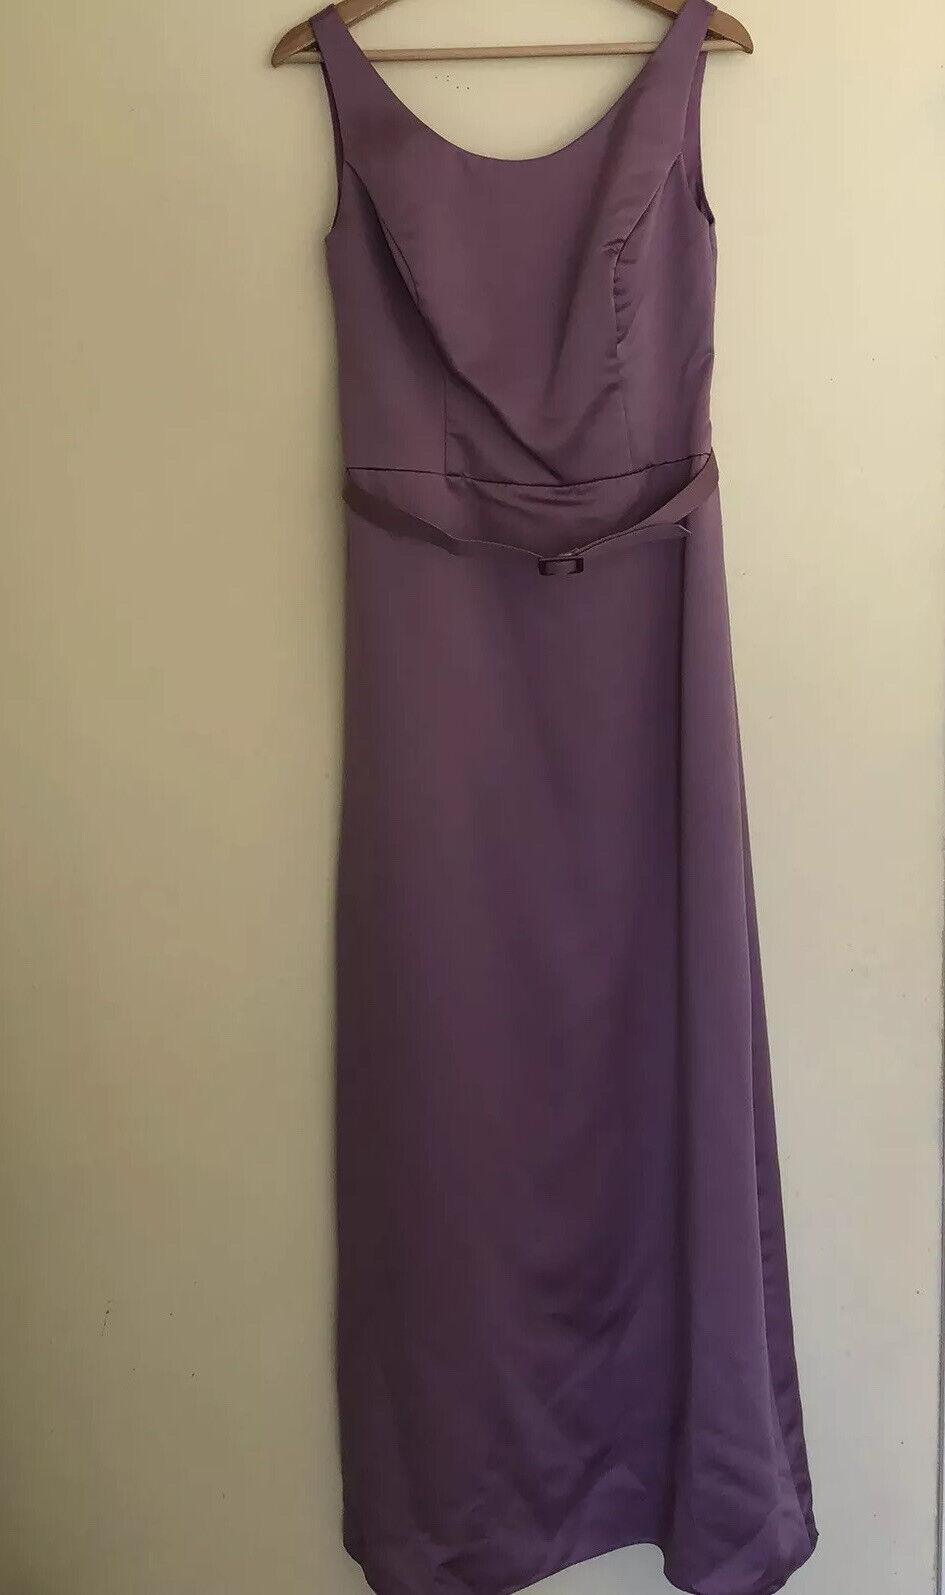 Alfred Angelo Women's Classic Purple Formal Wedding Bridesmaid PromDress Size 12